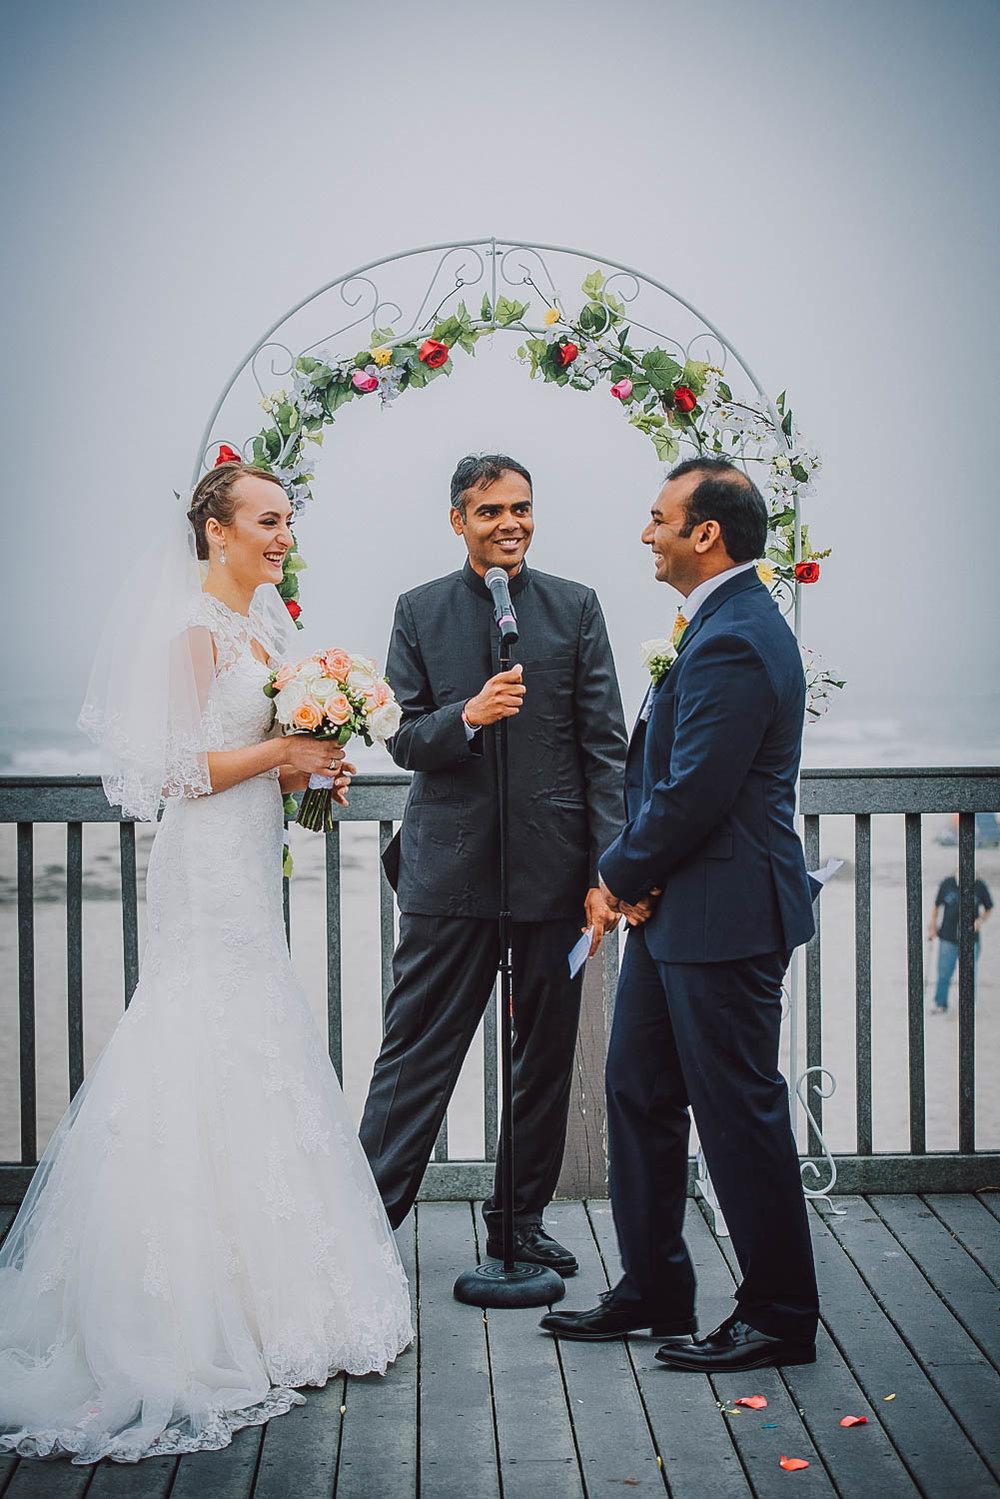 ecaterina-chandu-dondeti-wedding-photography29.jpg